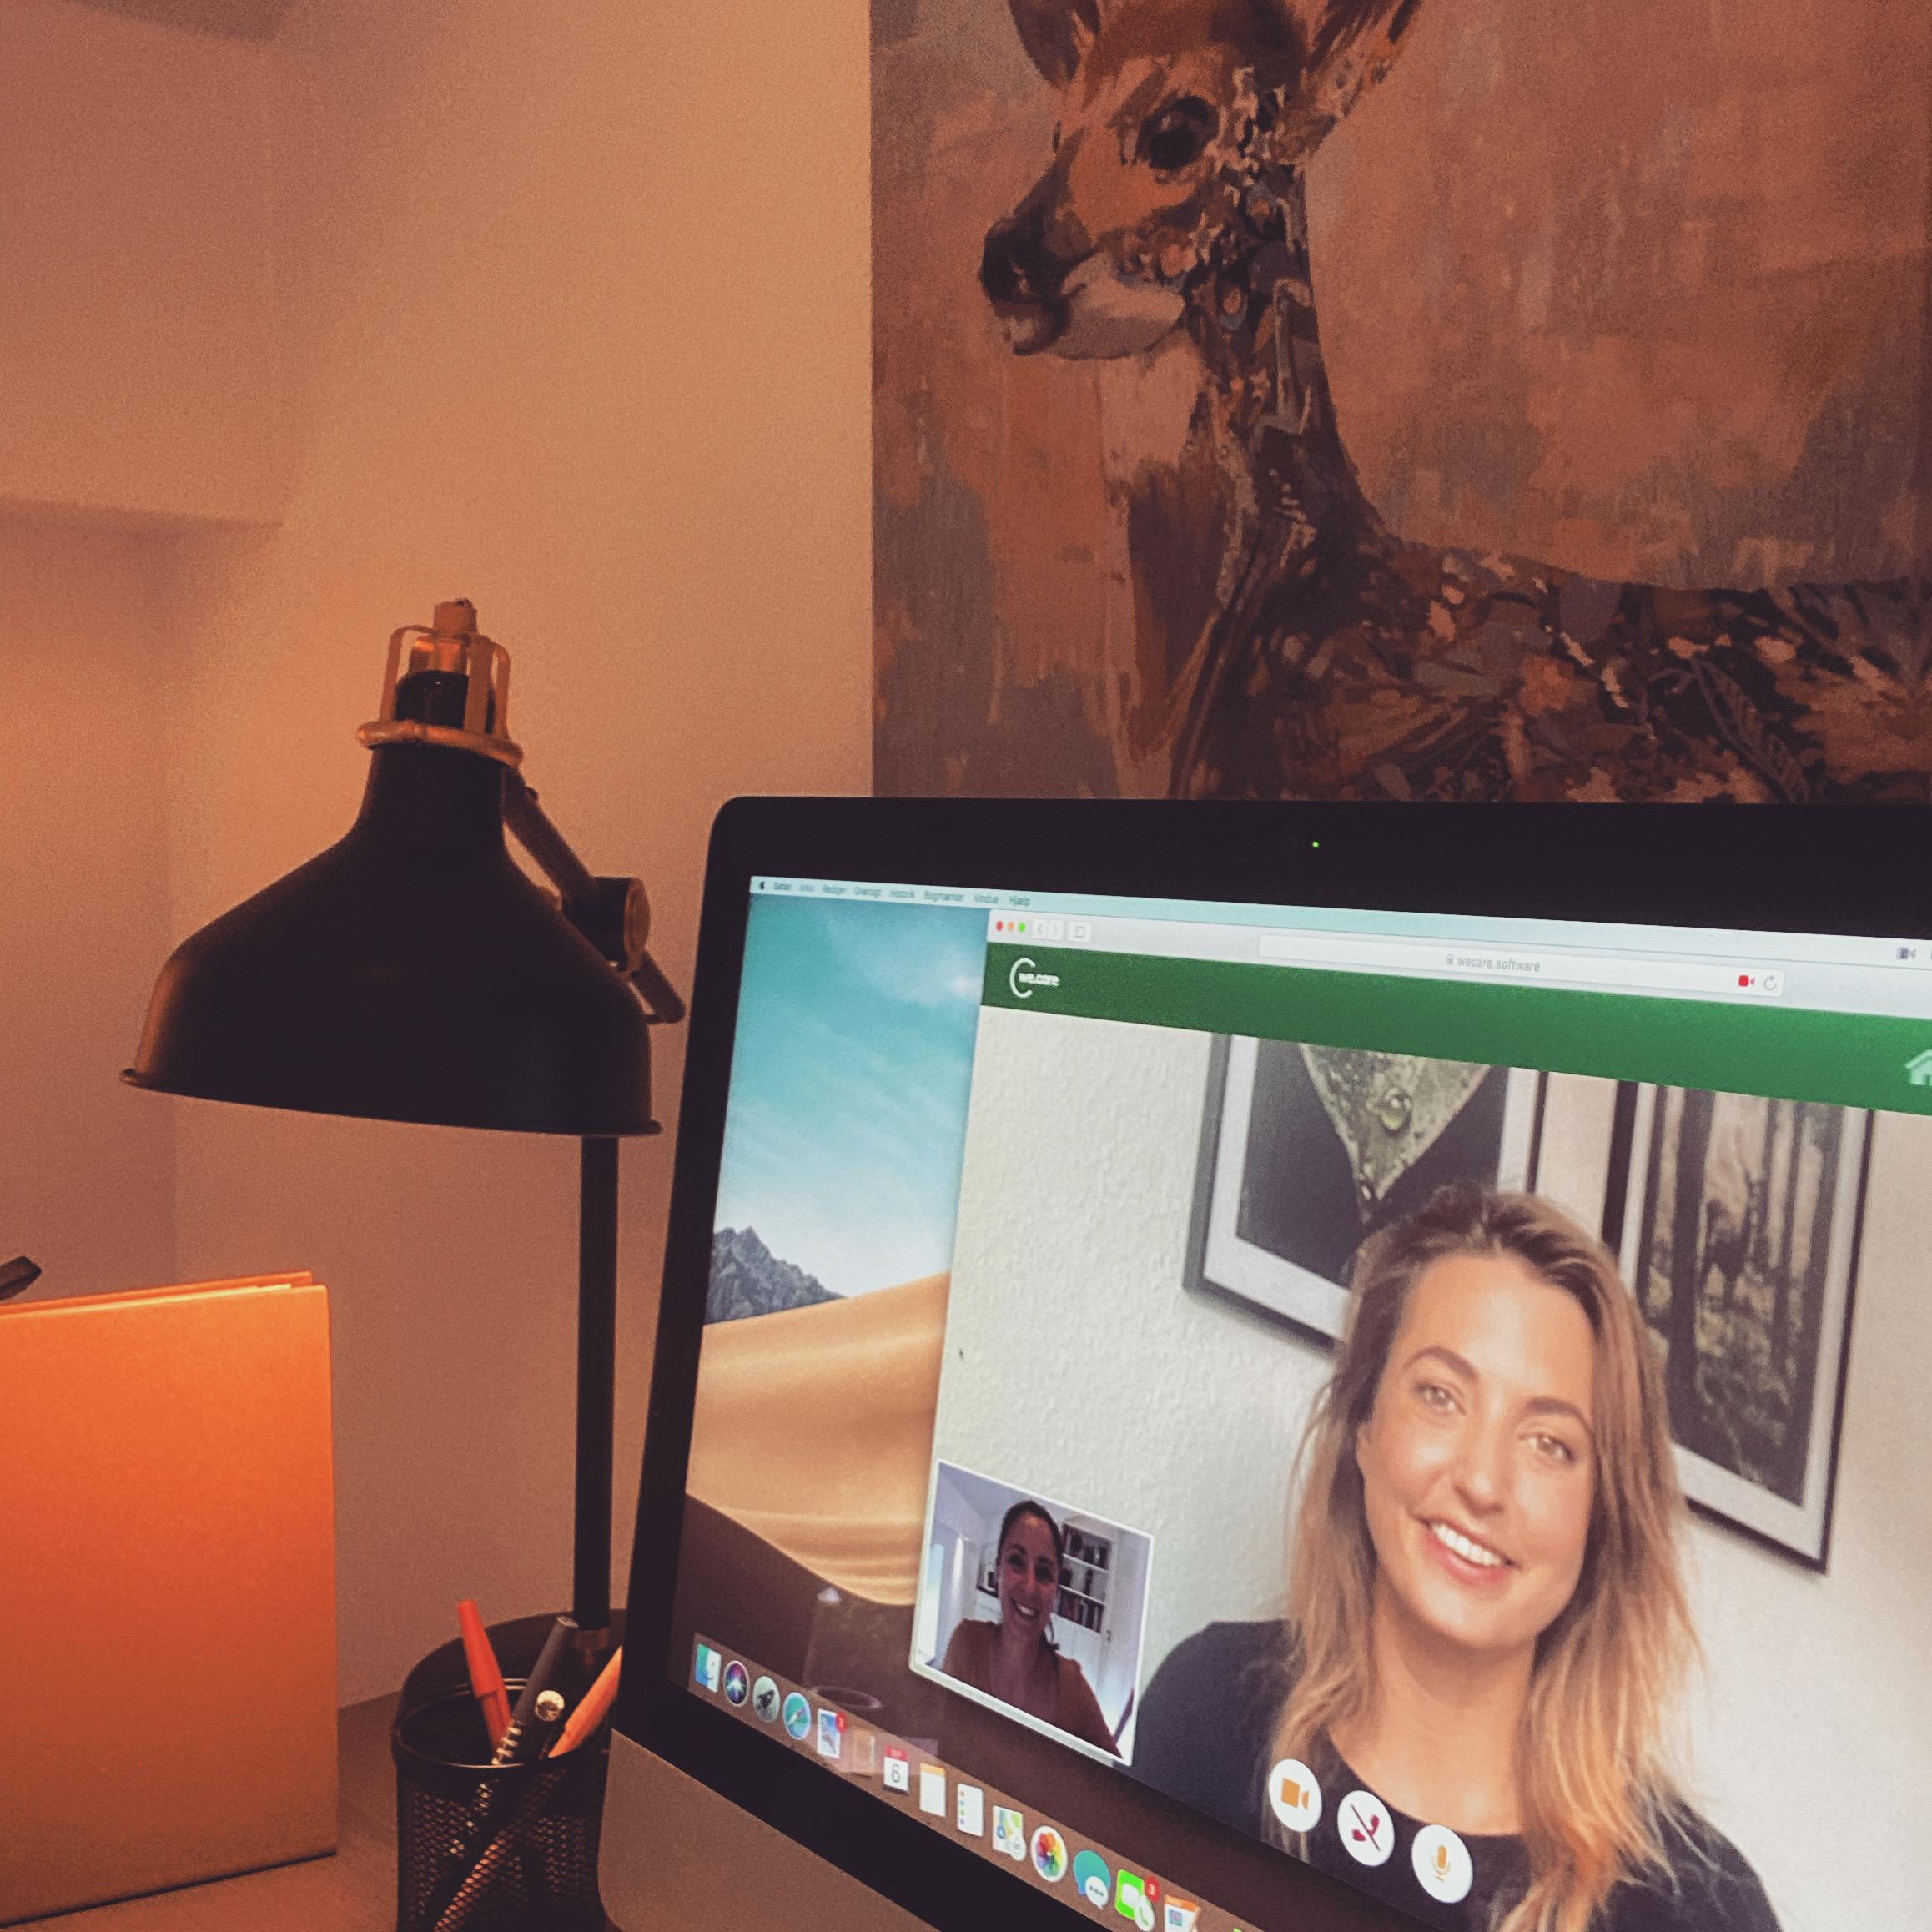 online terapi via videokonsultation ved autoriseret psykolog